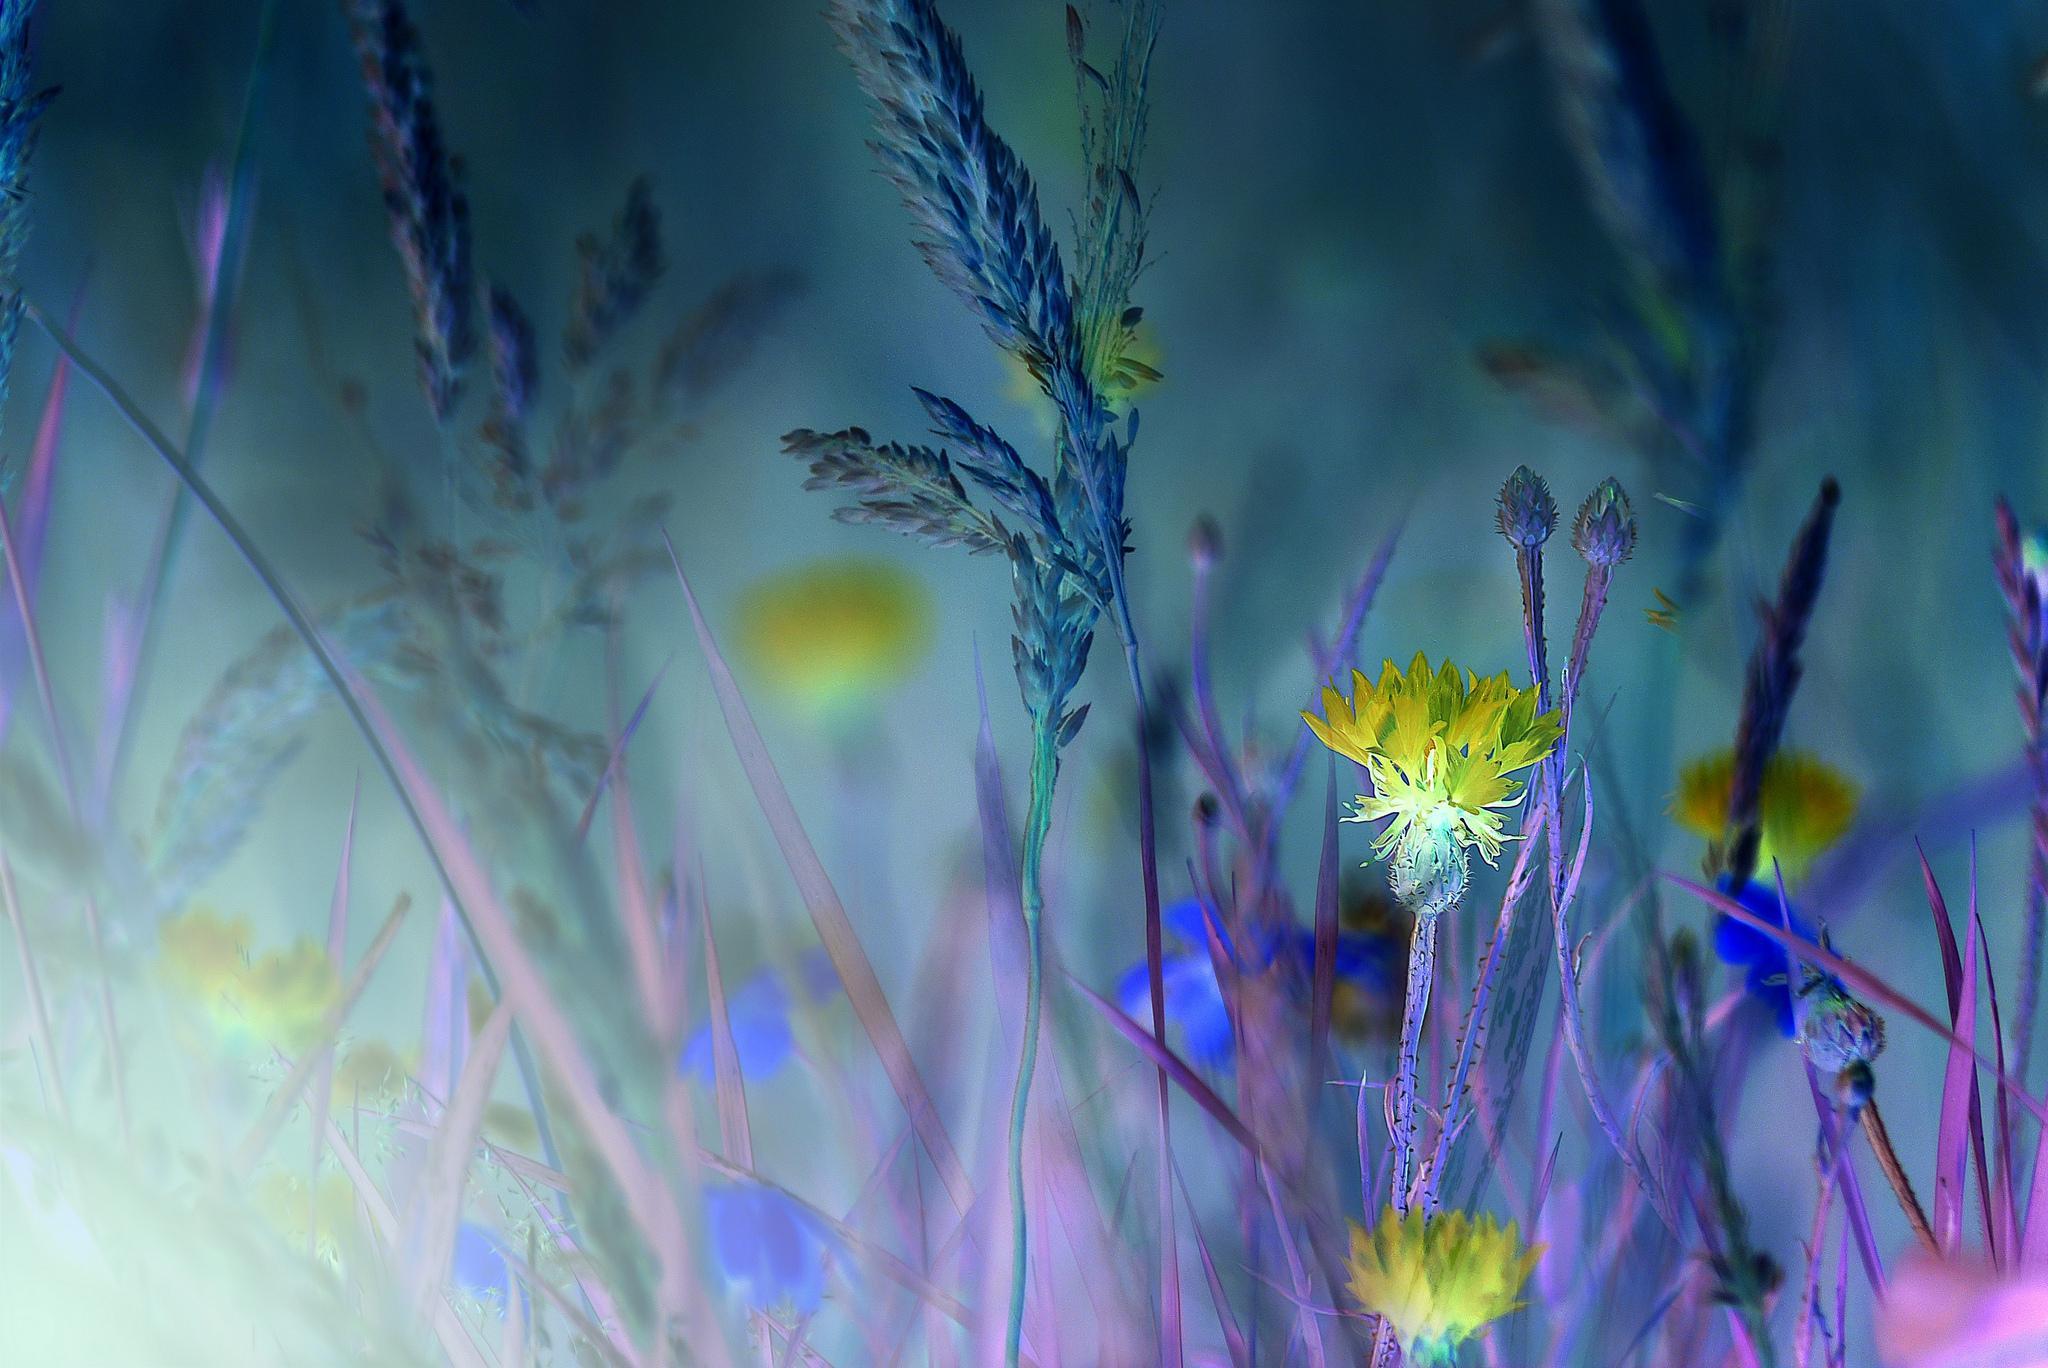 обои В ночь на поле, трава, цветы, макро картинки фото